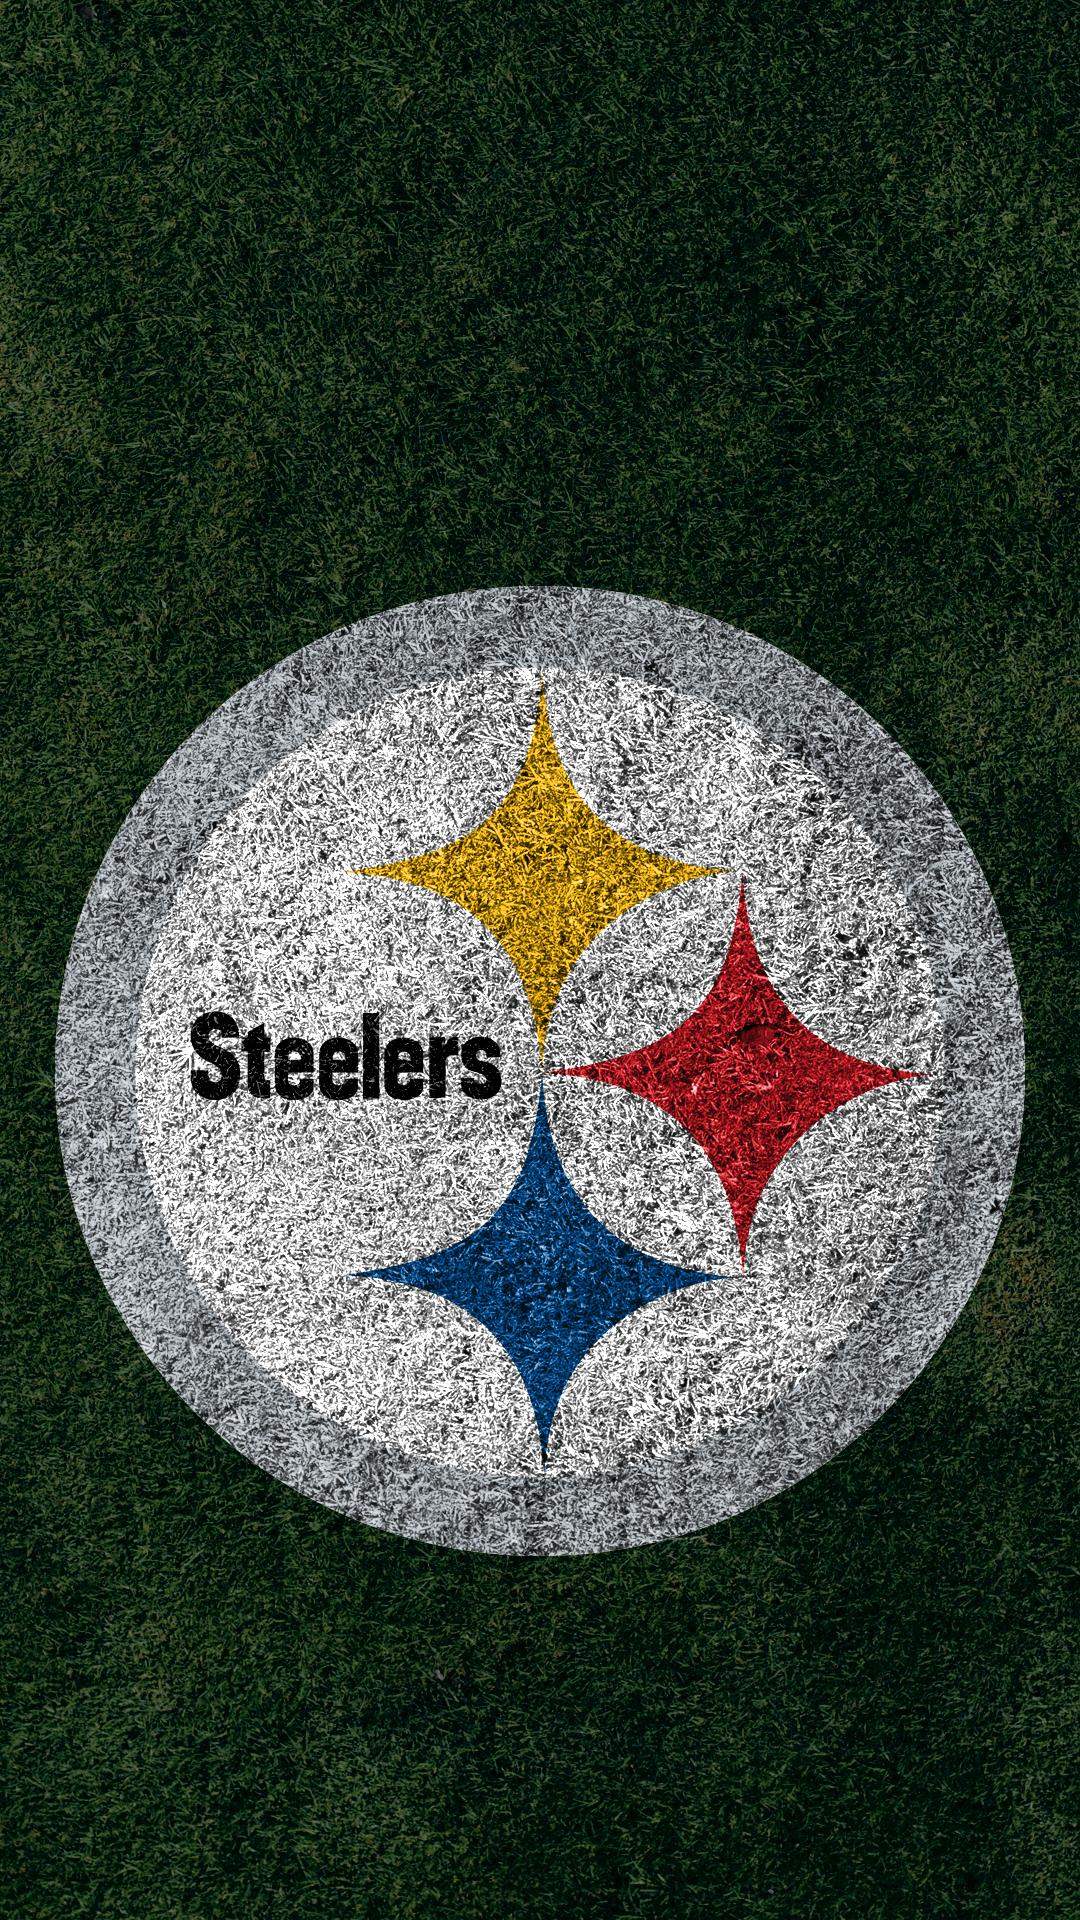 Steelers Wallpaper Iphone - wallpaper hd